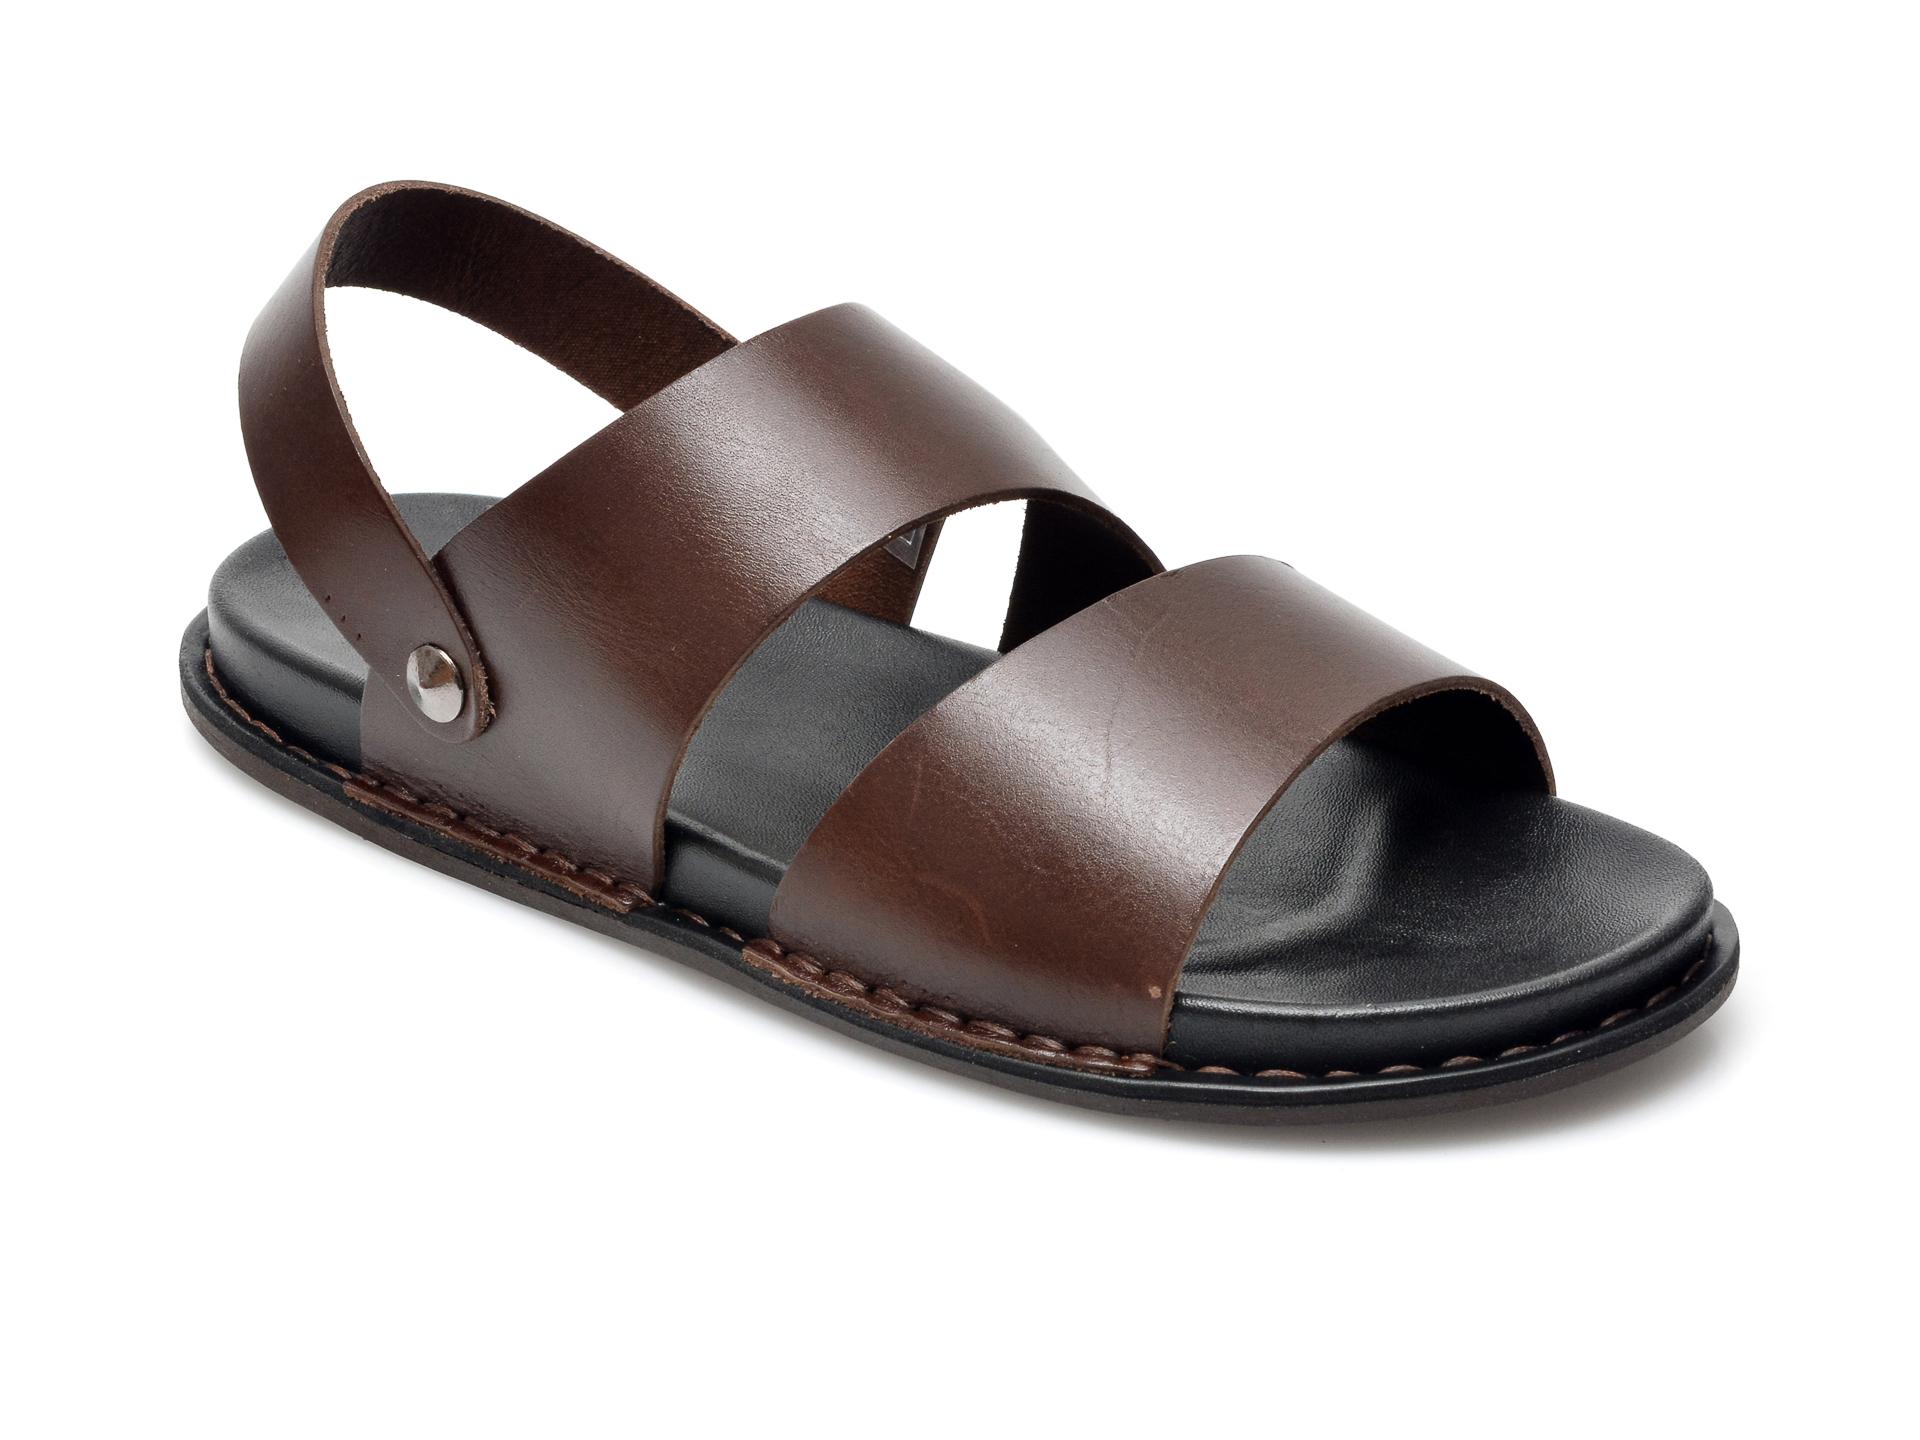 Sandale OTTER maro, 312, din piele naturala imagine